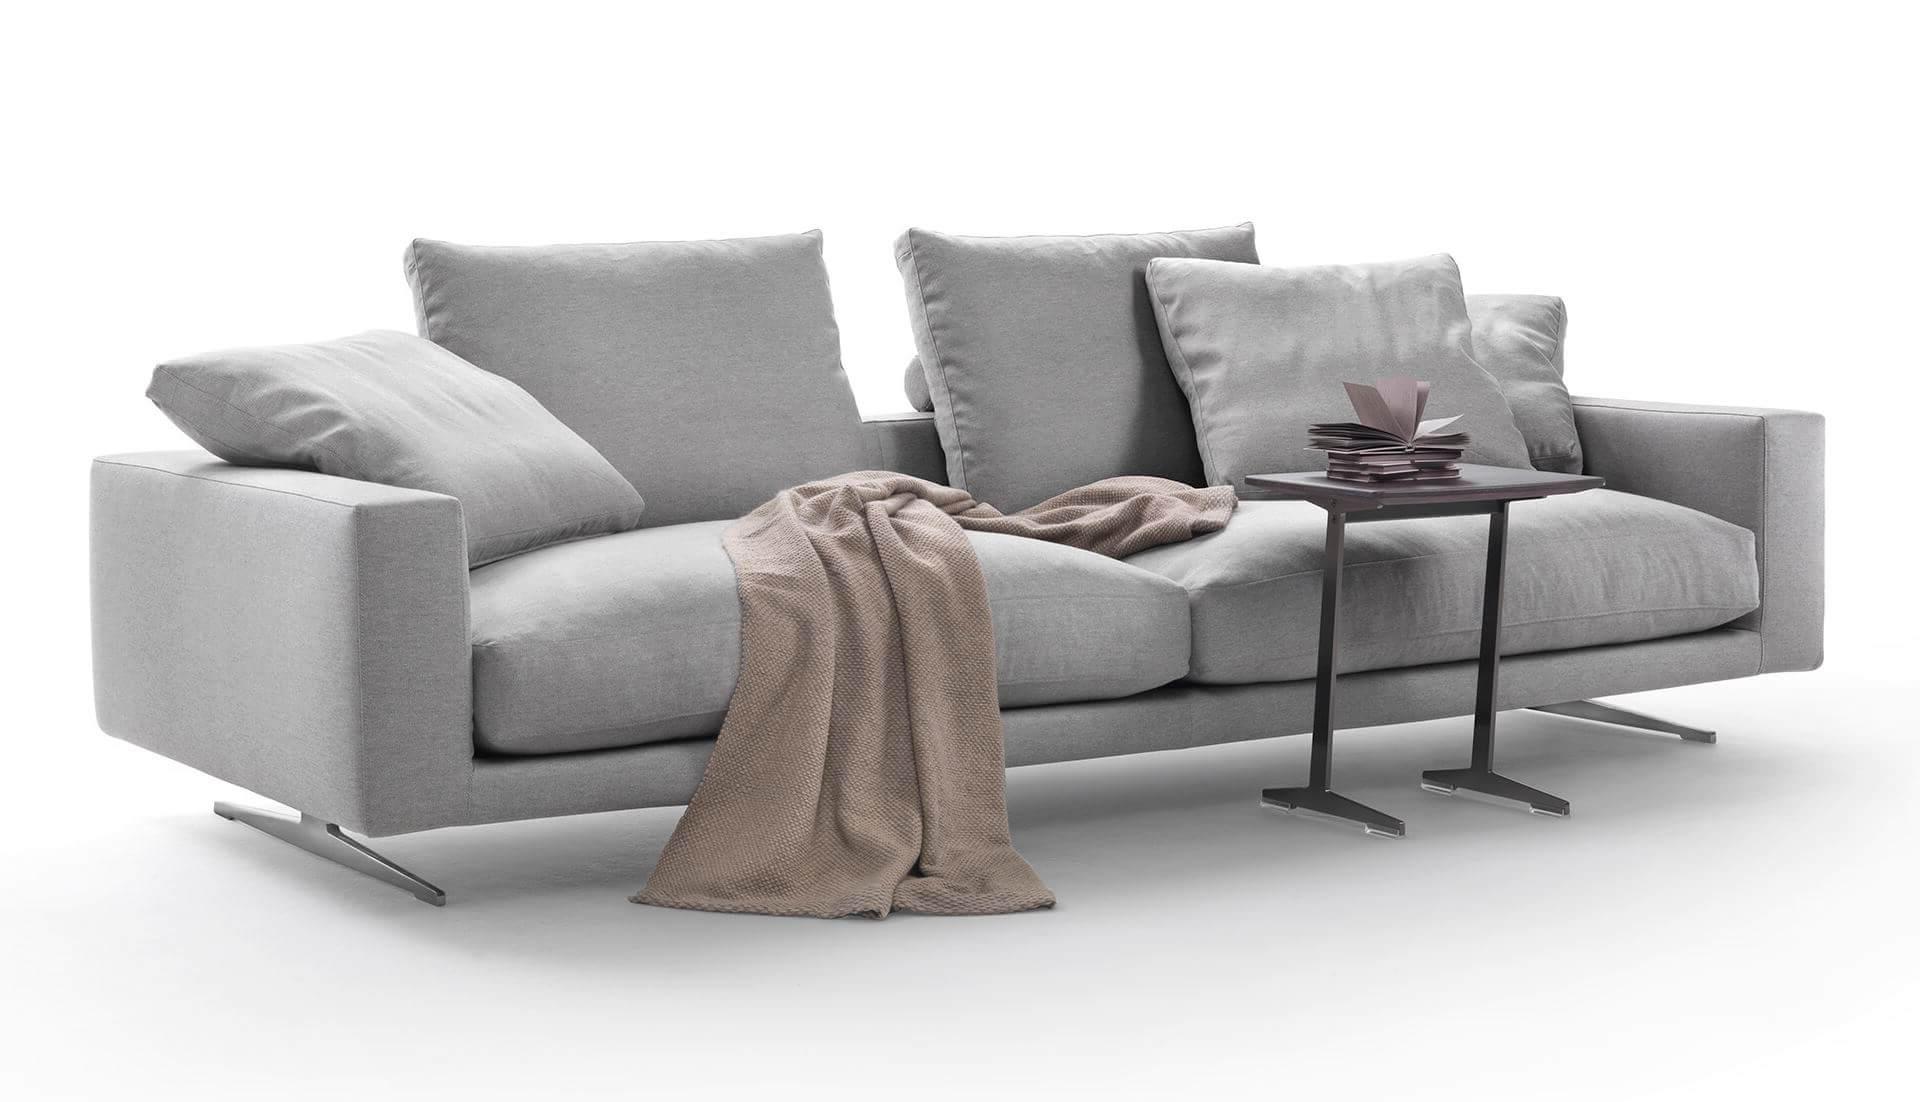 Most Current Dream Navy 3 Piece Modular Sofas With Flexform Campiello Modular Sofa – Dream Design Interiors Ltd (View 5 of 15)